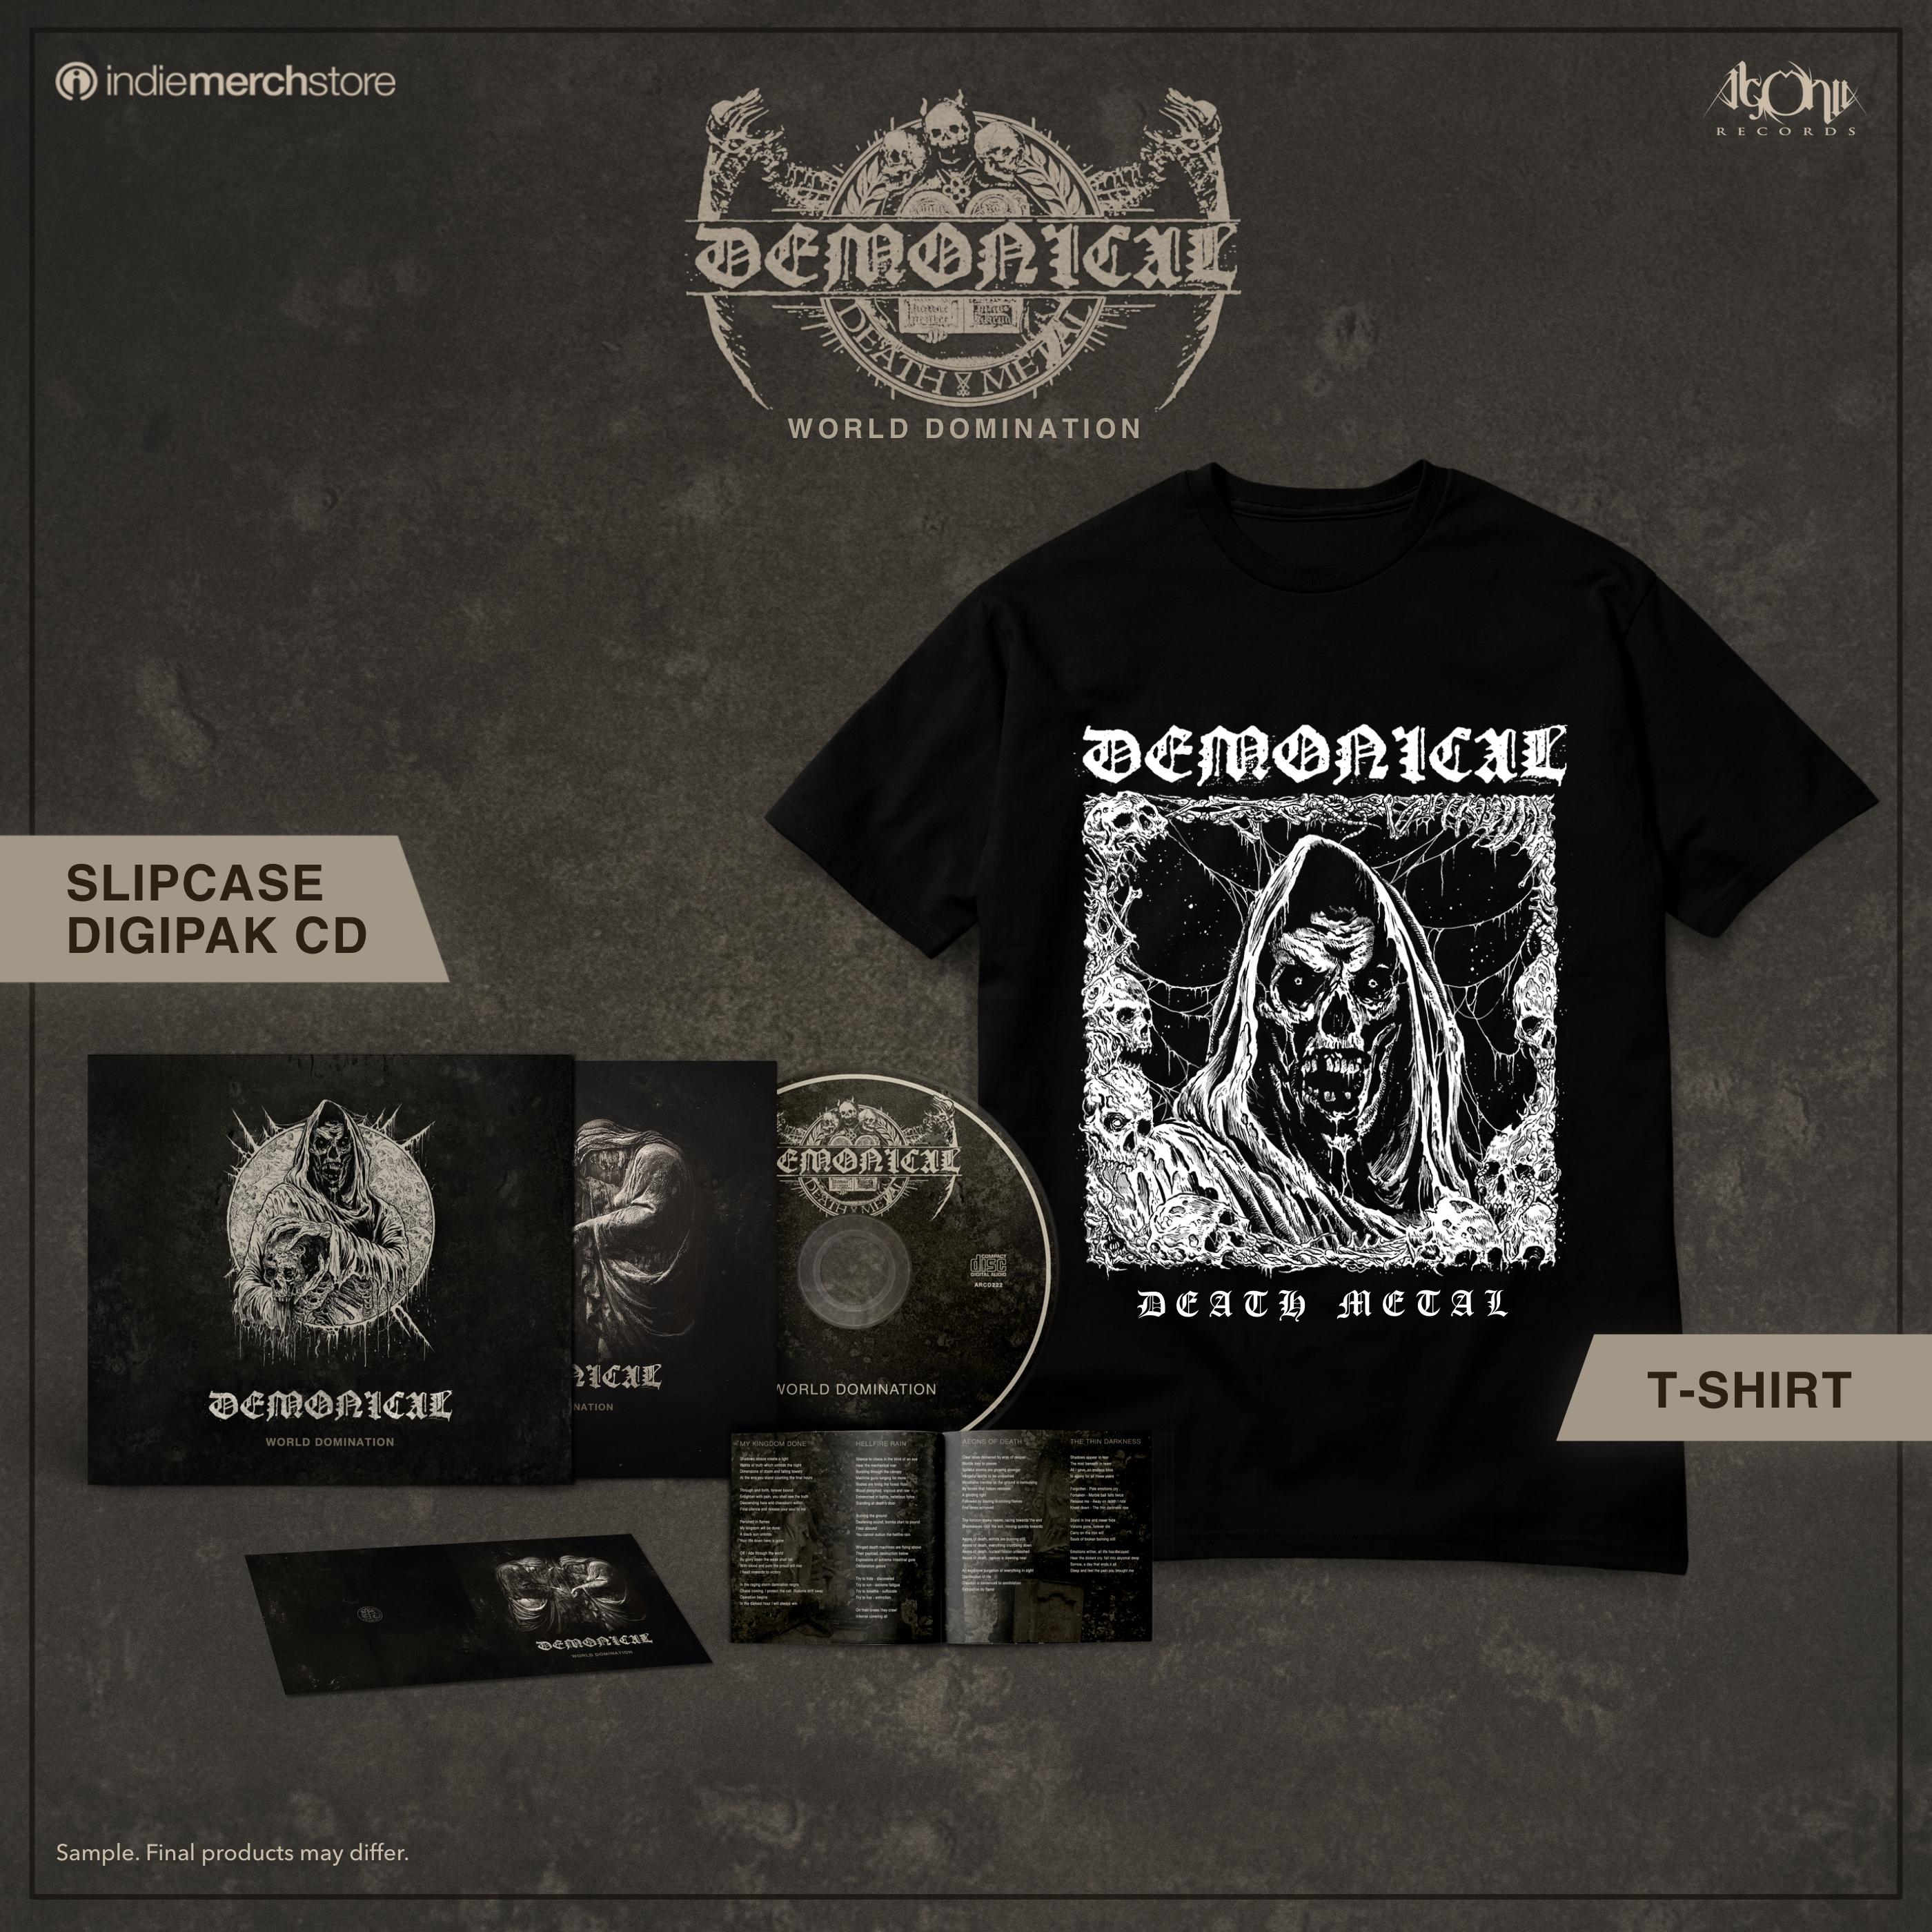 World Domination CD + Tee Bundle